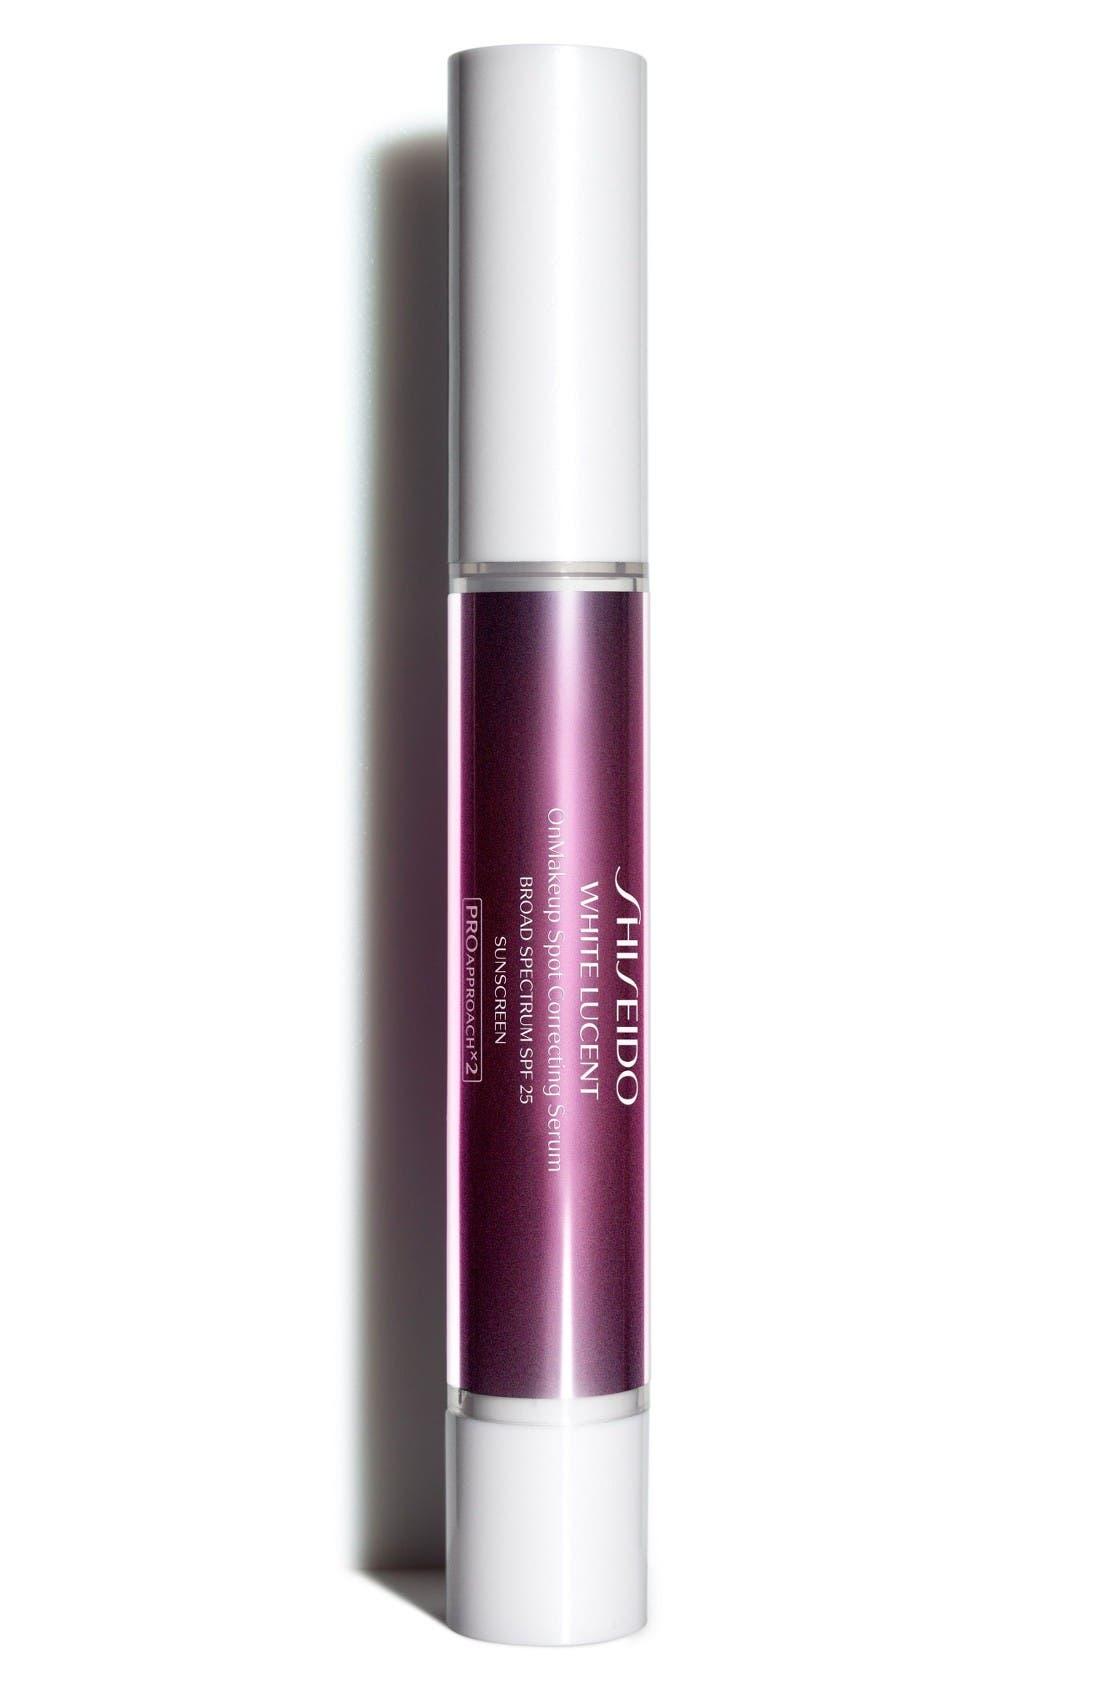 Main Image - Shiseido White Lucent OnMakeup Spot Correcting Serum Broad Spectrum SPF 25